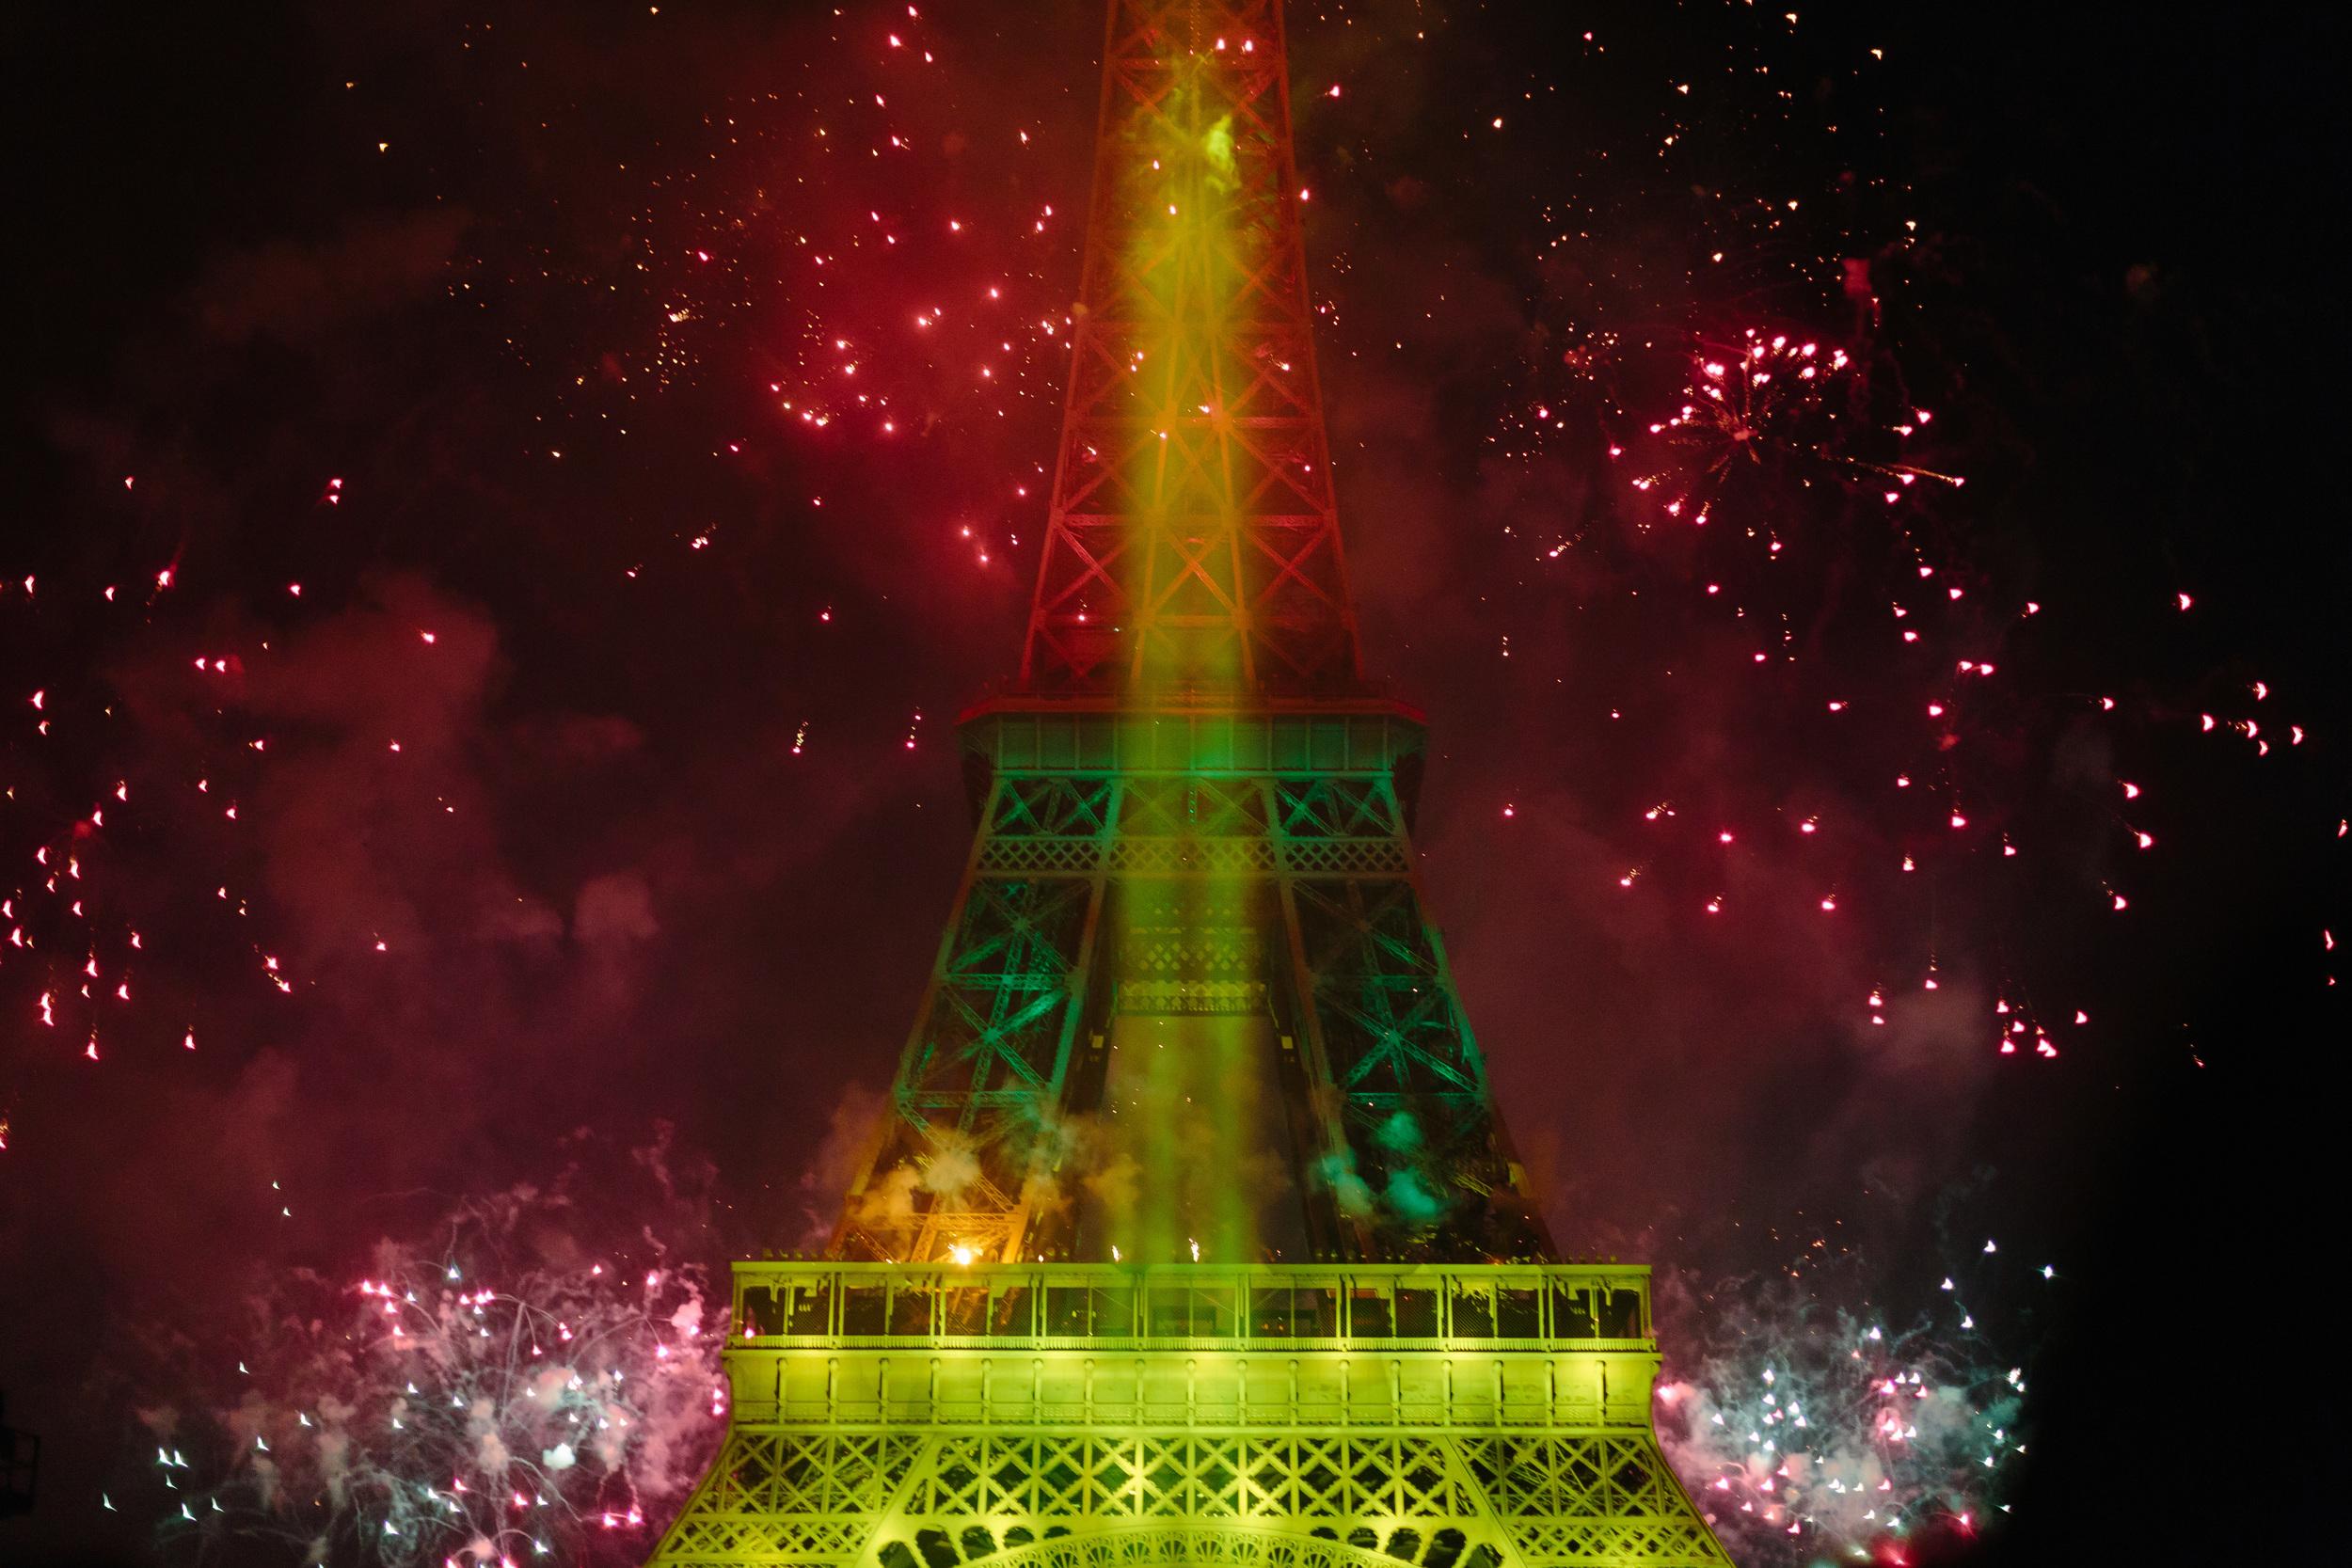 14 July, Bastille day, Photographer in Paris, Eiffel Tower, Iheartparisfr